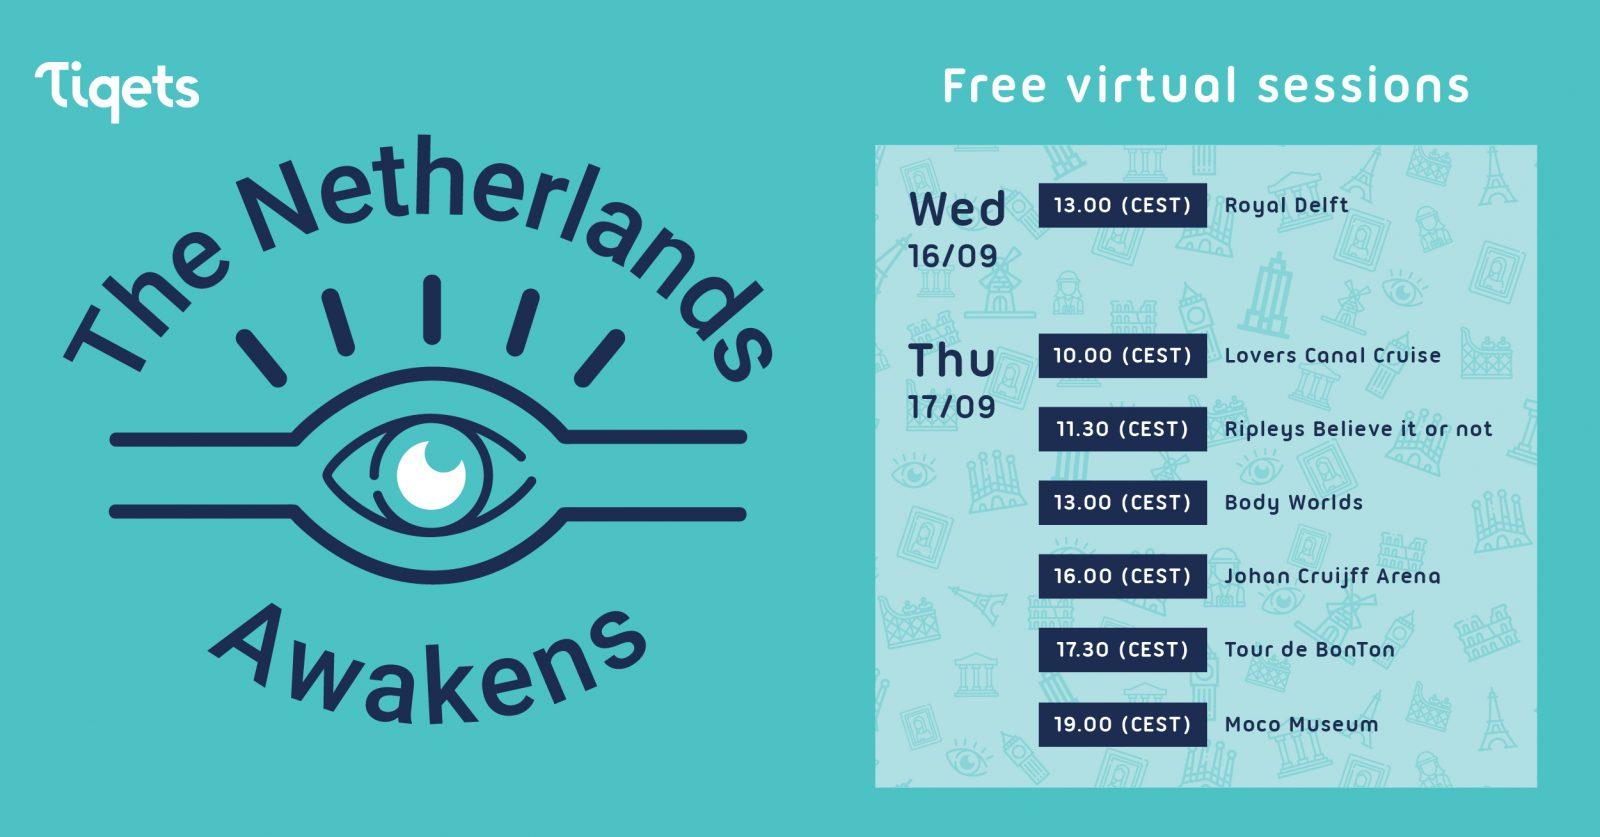 The Netherlands Awekens Line Up